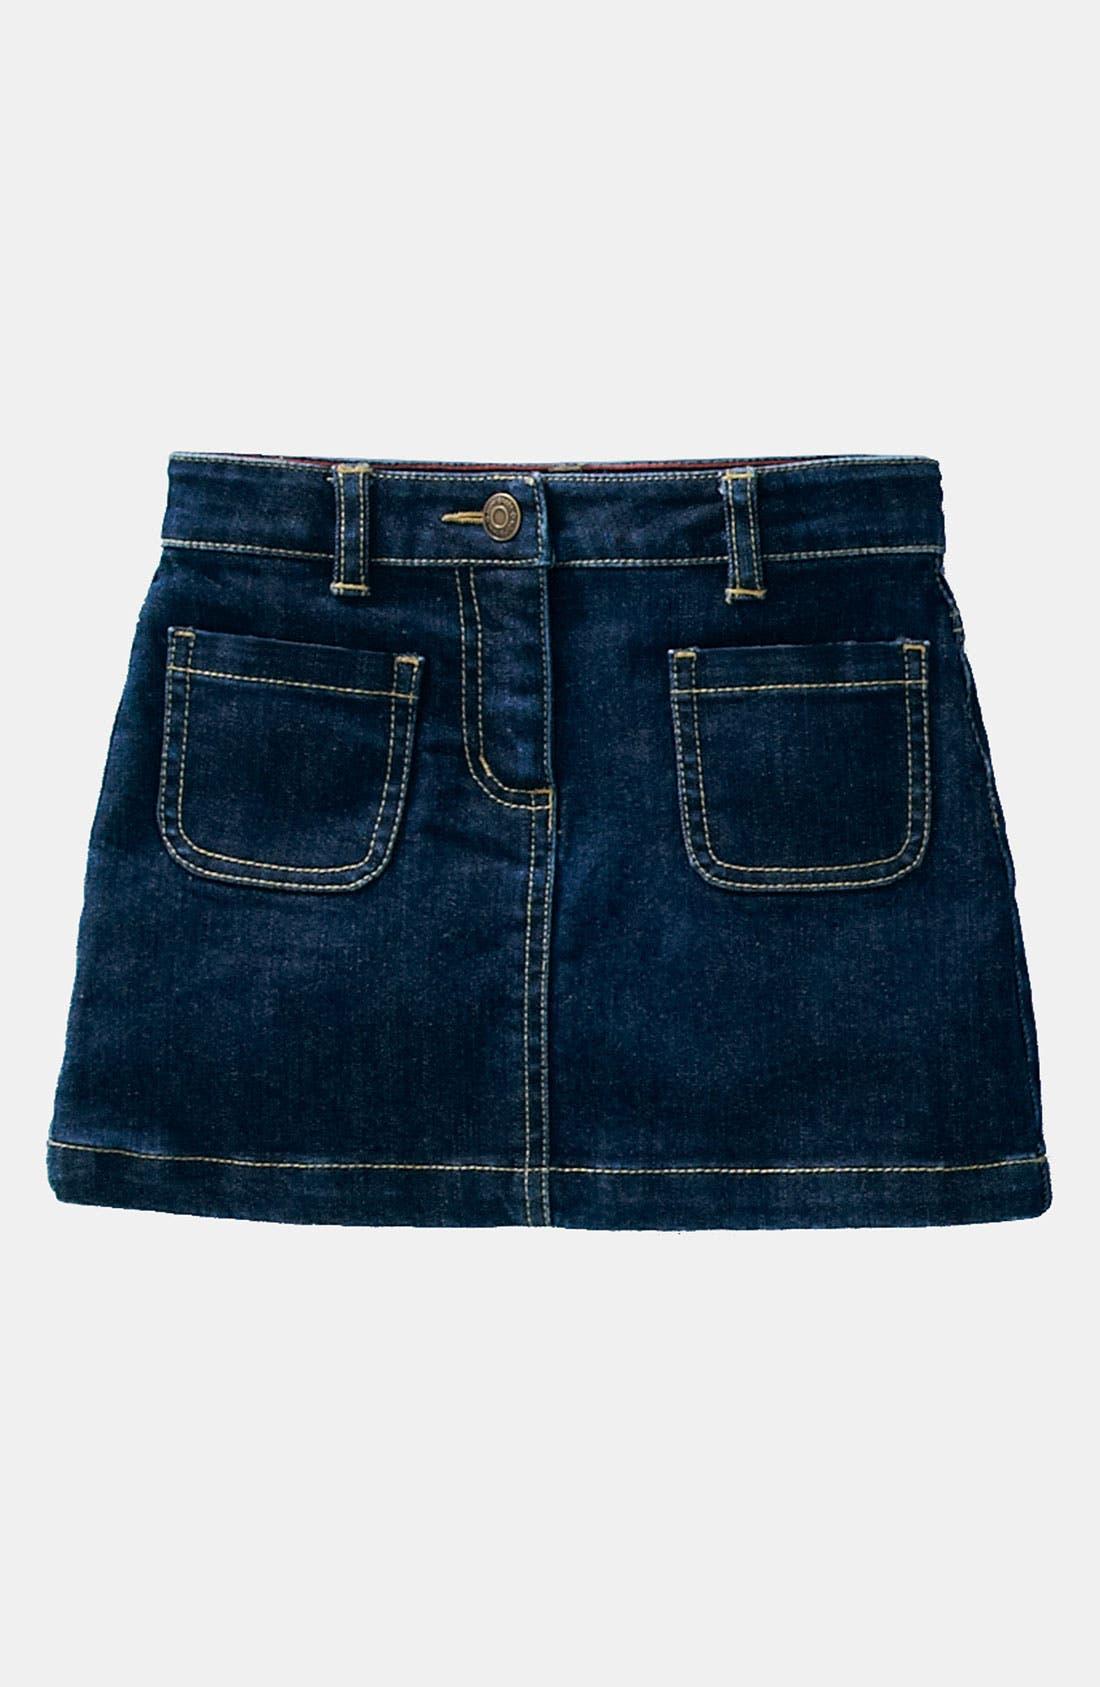 Alternate Image 1 Selected - Mini Boden 'Patch Pocket' Skirt (Little Girls & Big Girls)